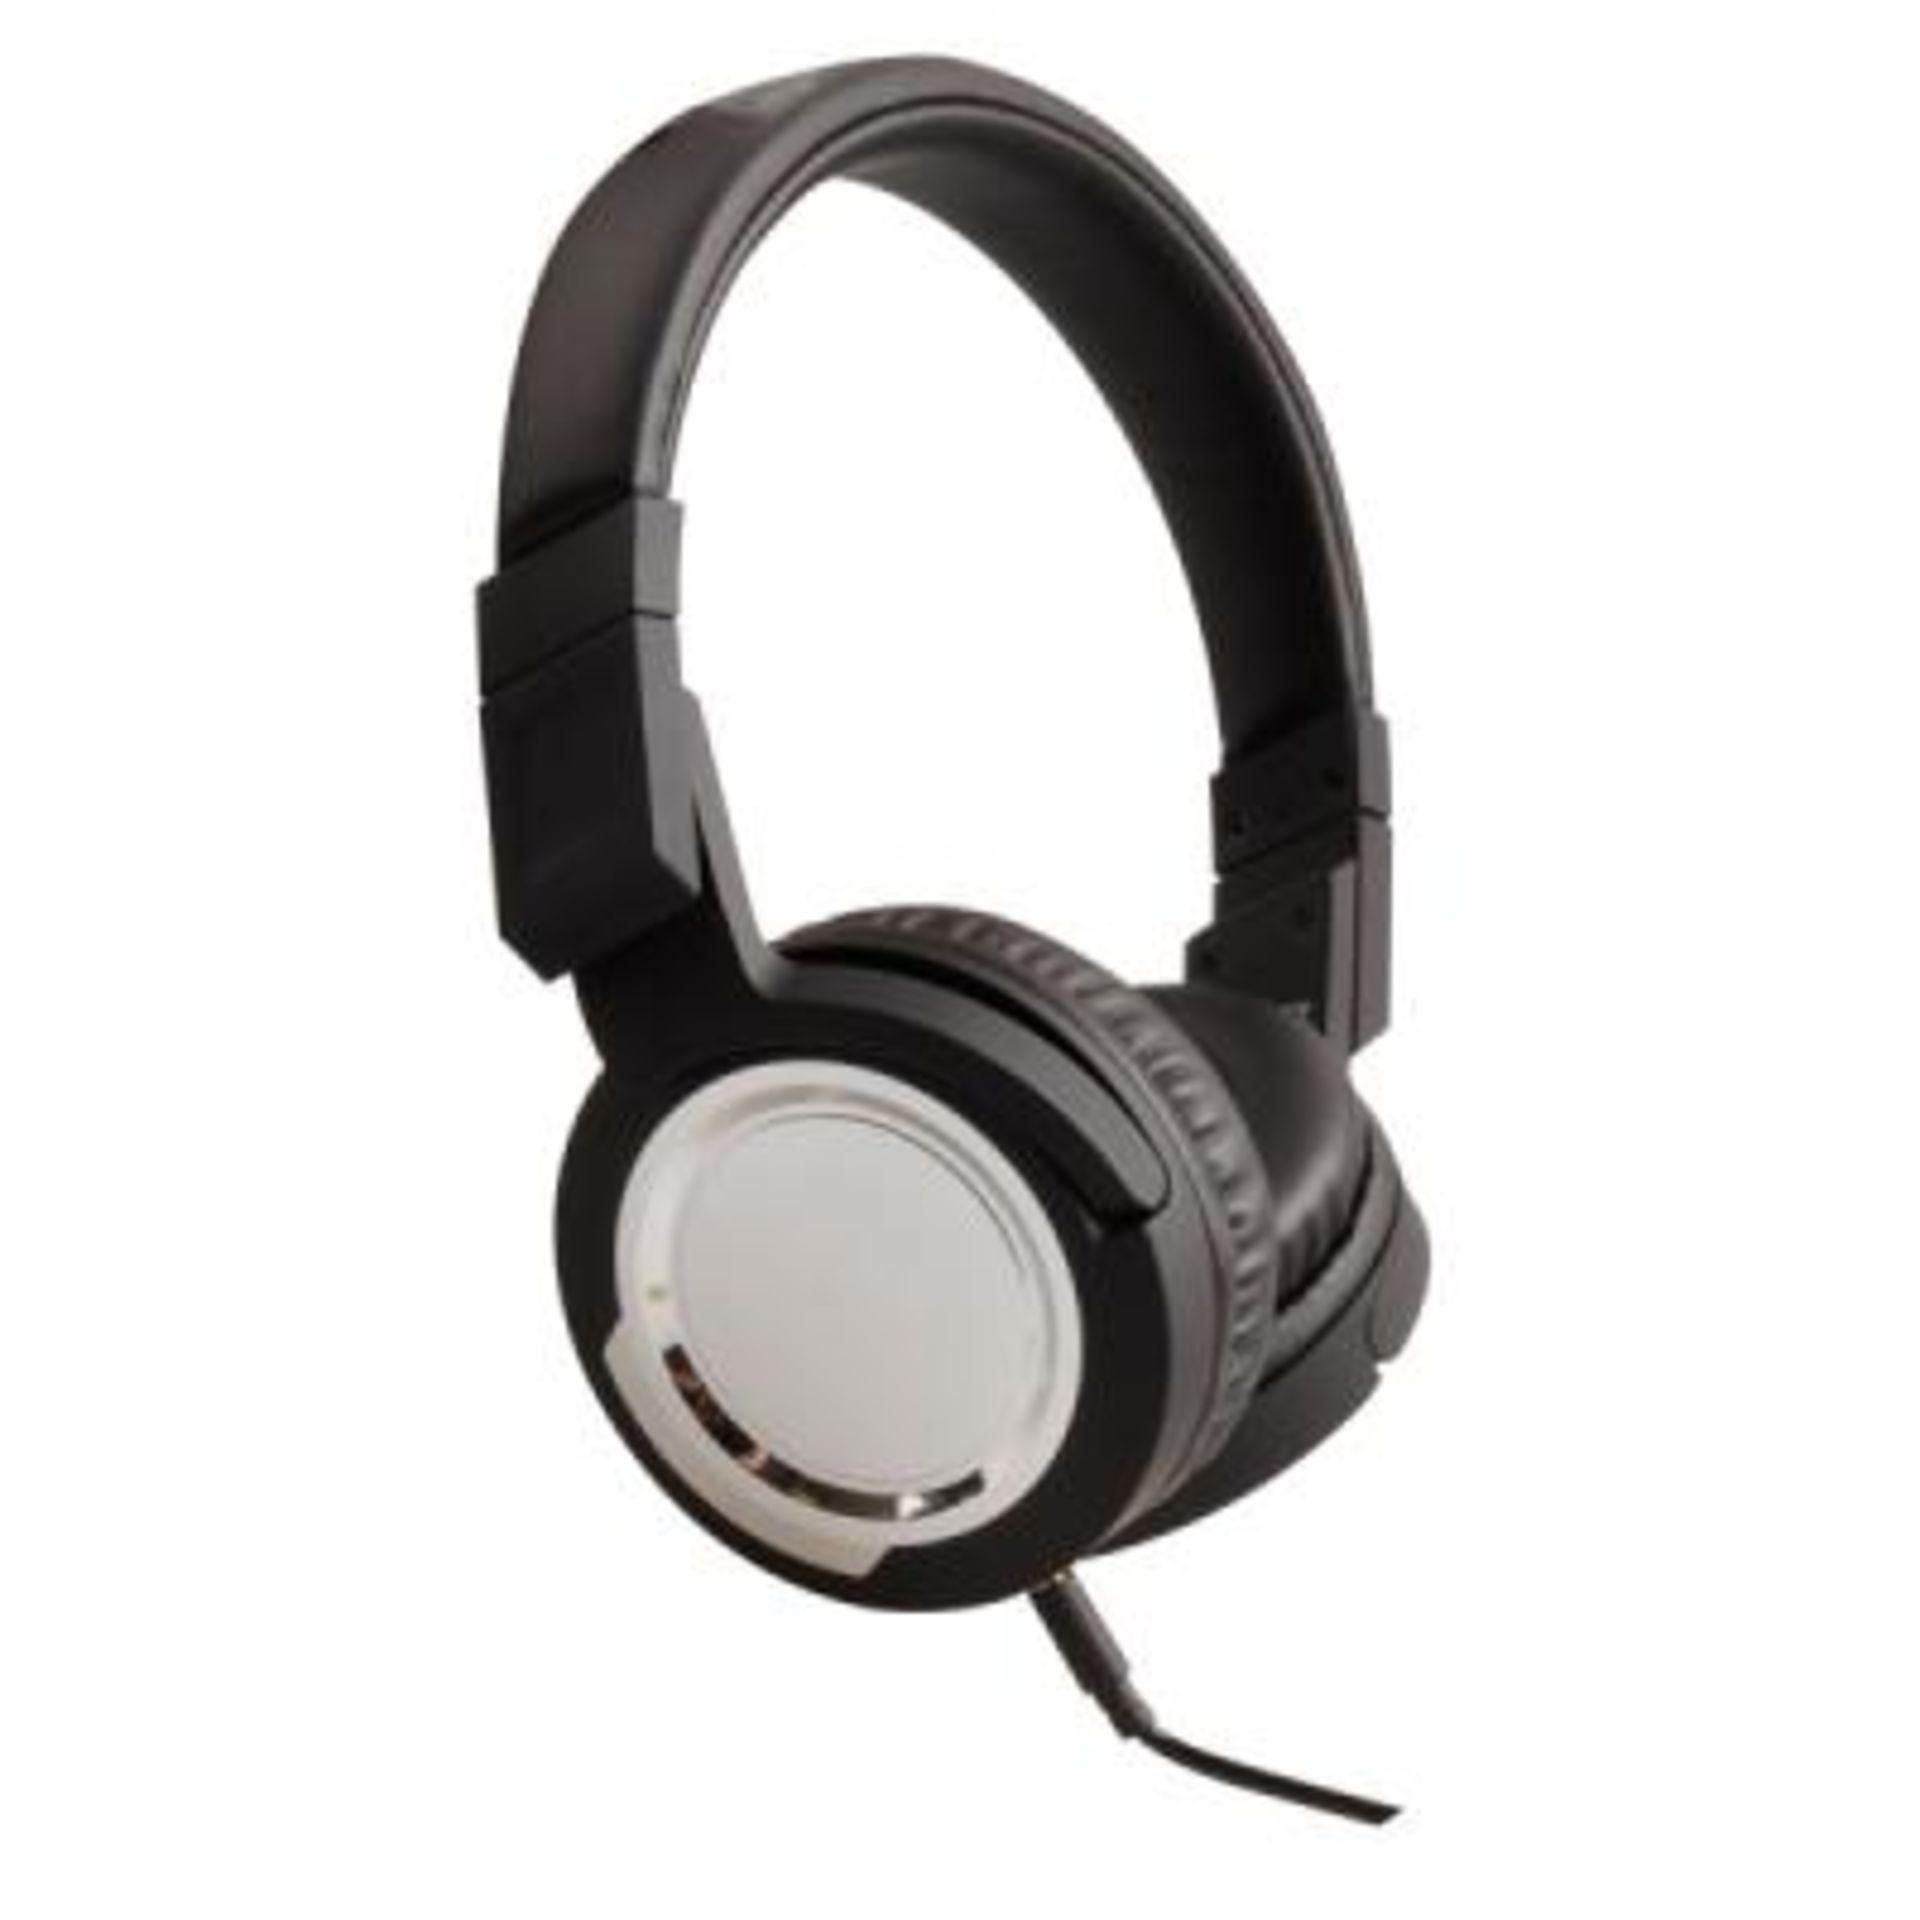 Lot 10652 - + VAT Brand New On-Earz DJ Headset - High Definition - Crazy Bass & Crystal Clear Sound - Rotating